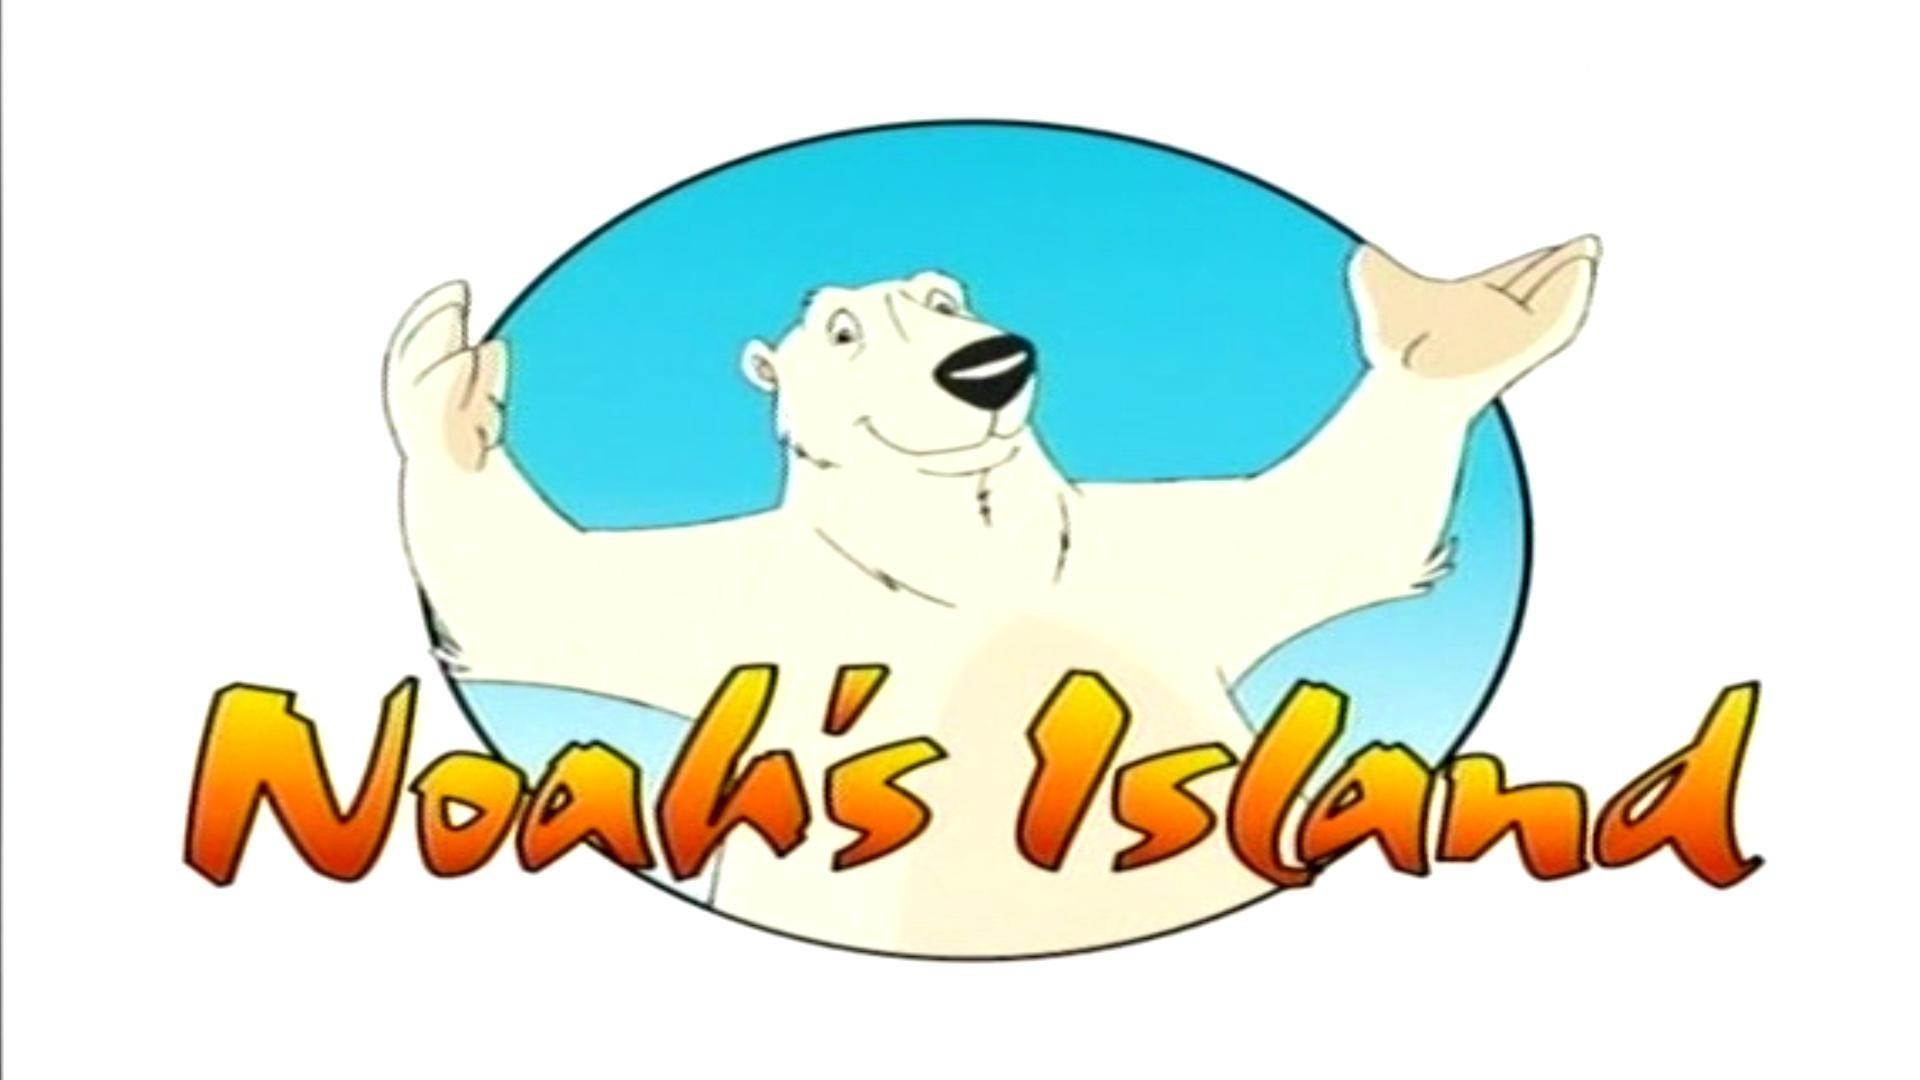 Show Noah's Island